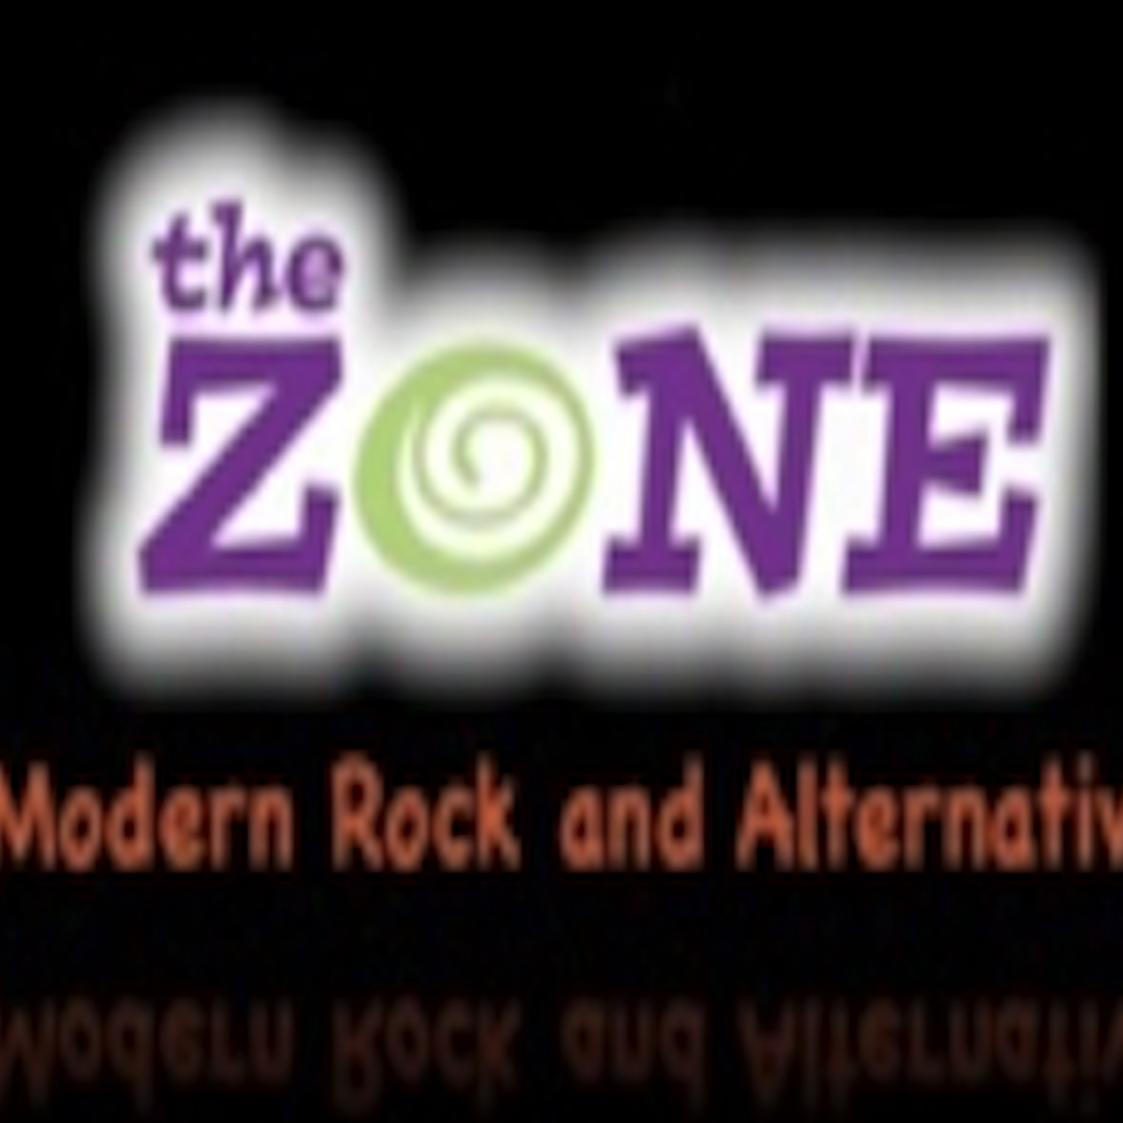 Zone - Dublin